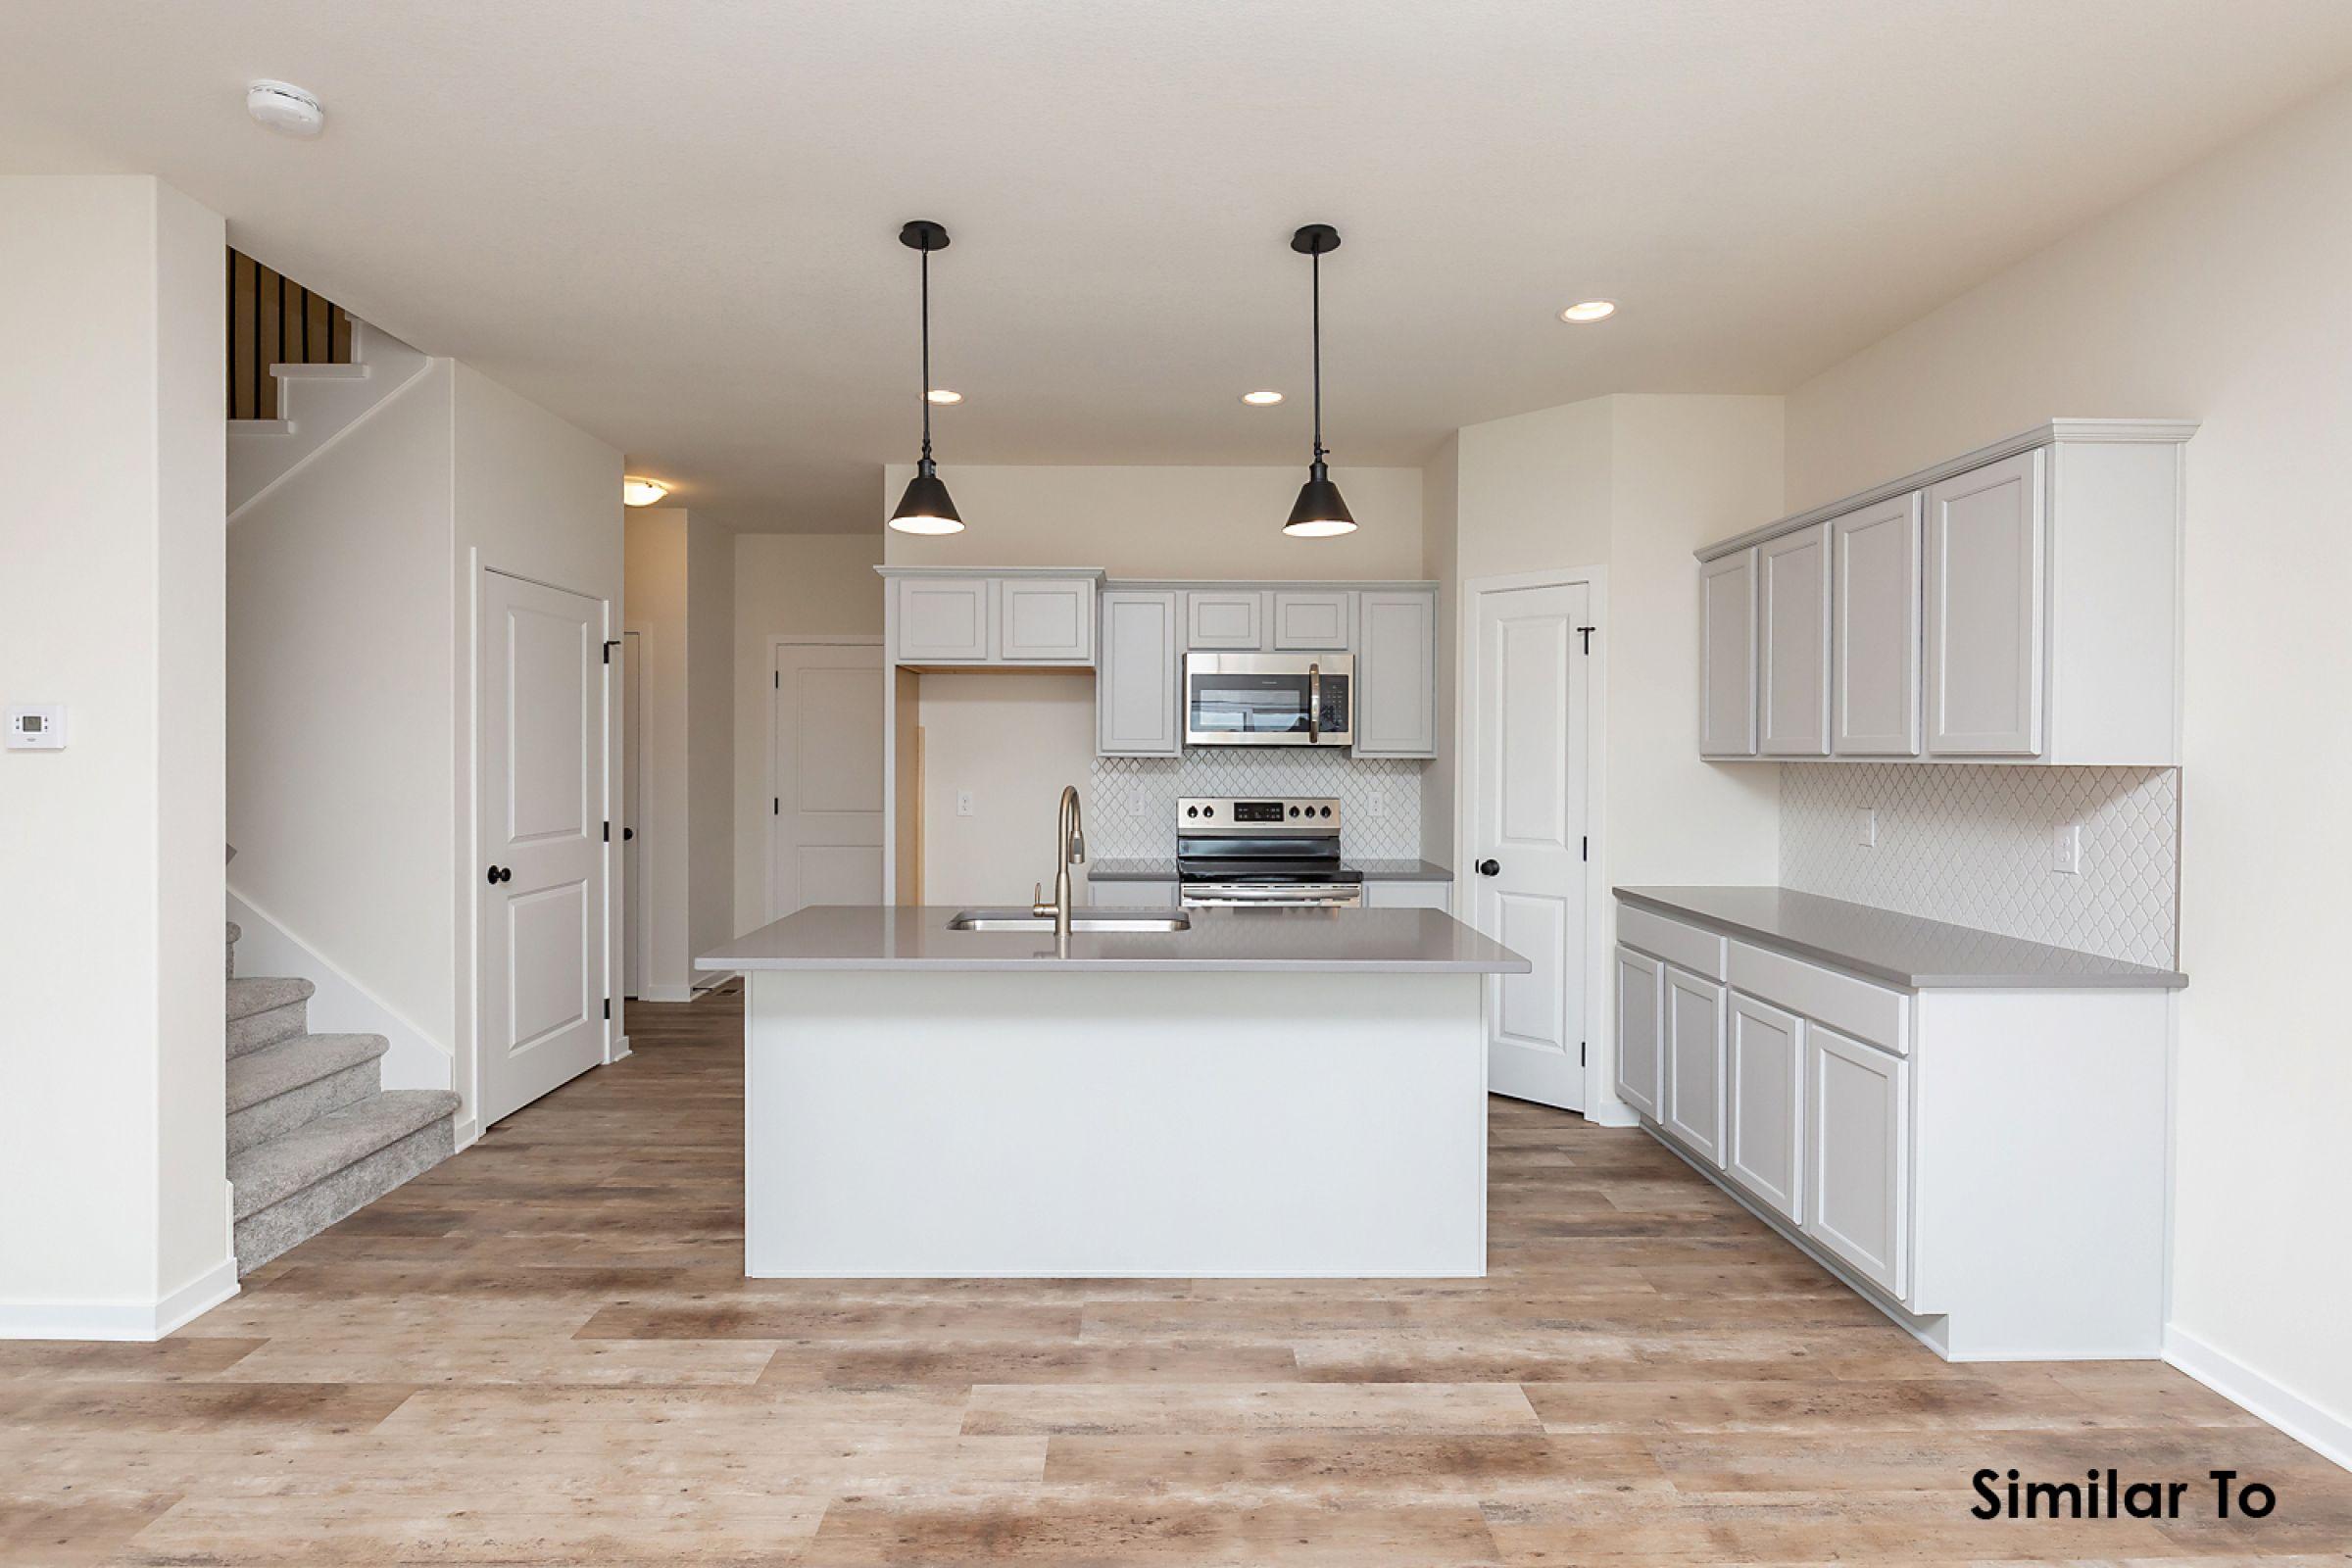 residential-warren-county-iowa-0-acres-listing-number-15138-3-2020-08-28-172750.jpg